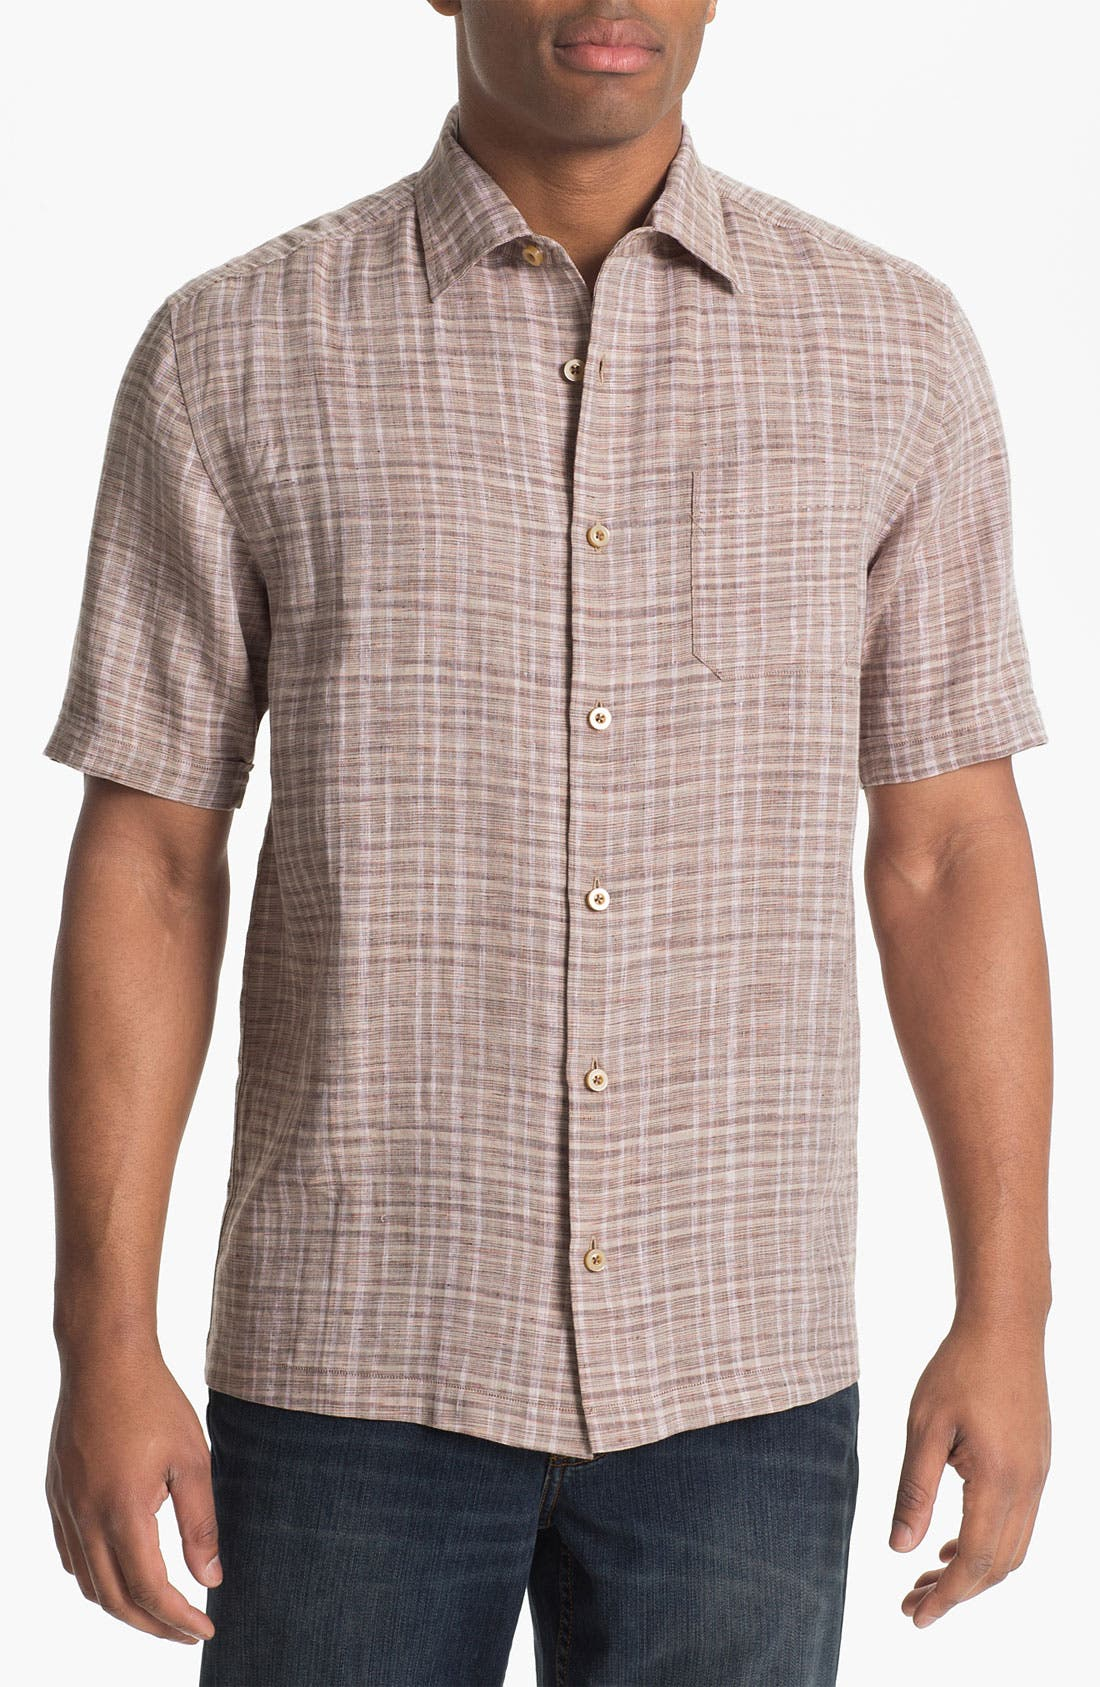 Alternate Image 1 Selected - Tommy Bahama 'Bravo Blanco' Linen Campshirt